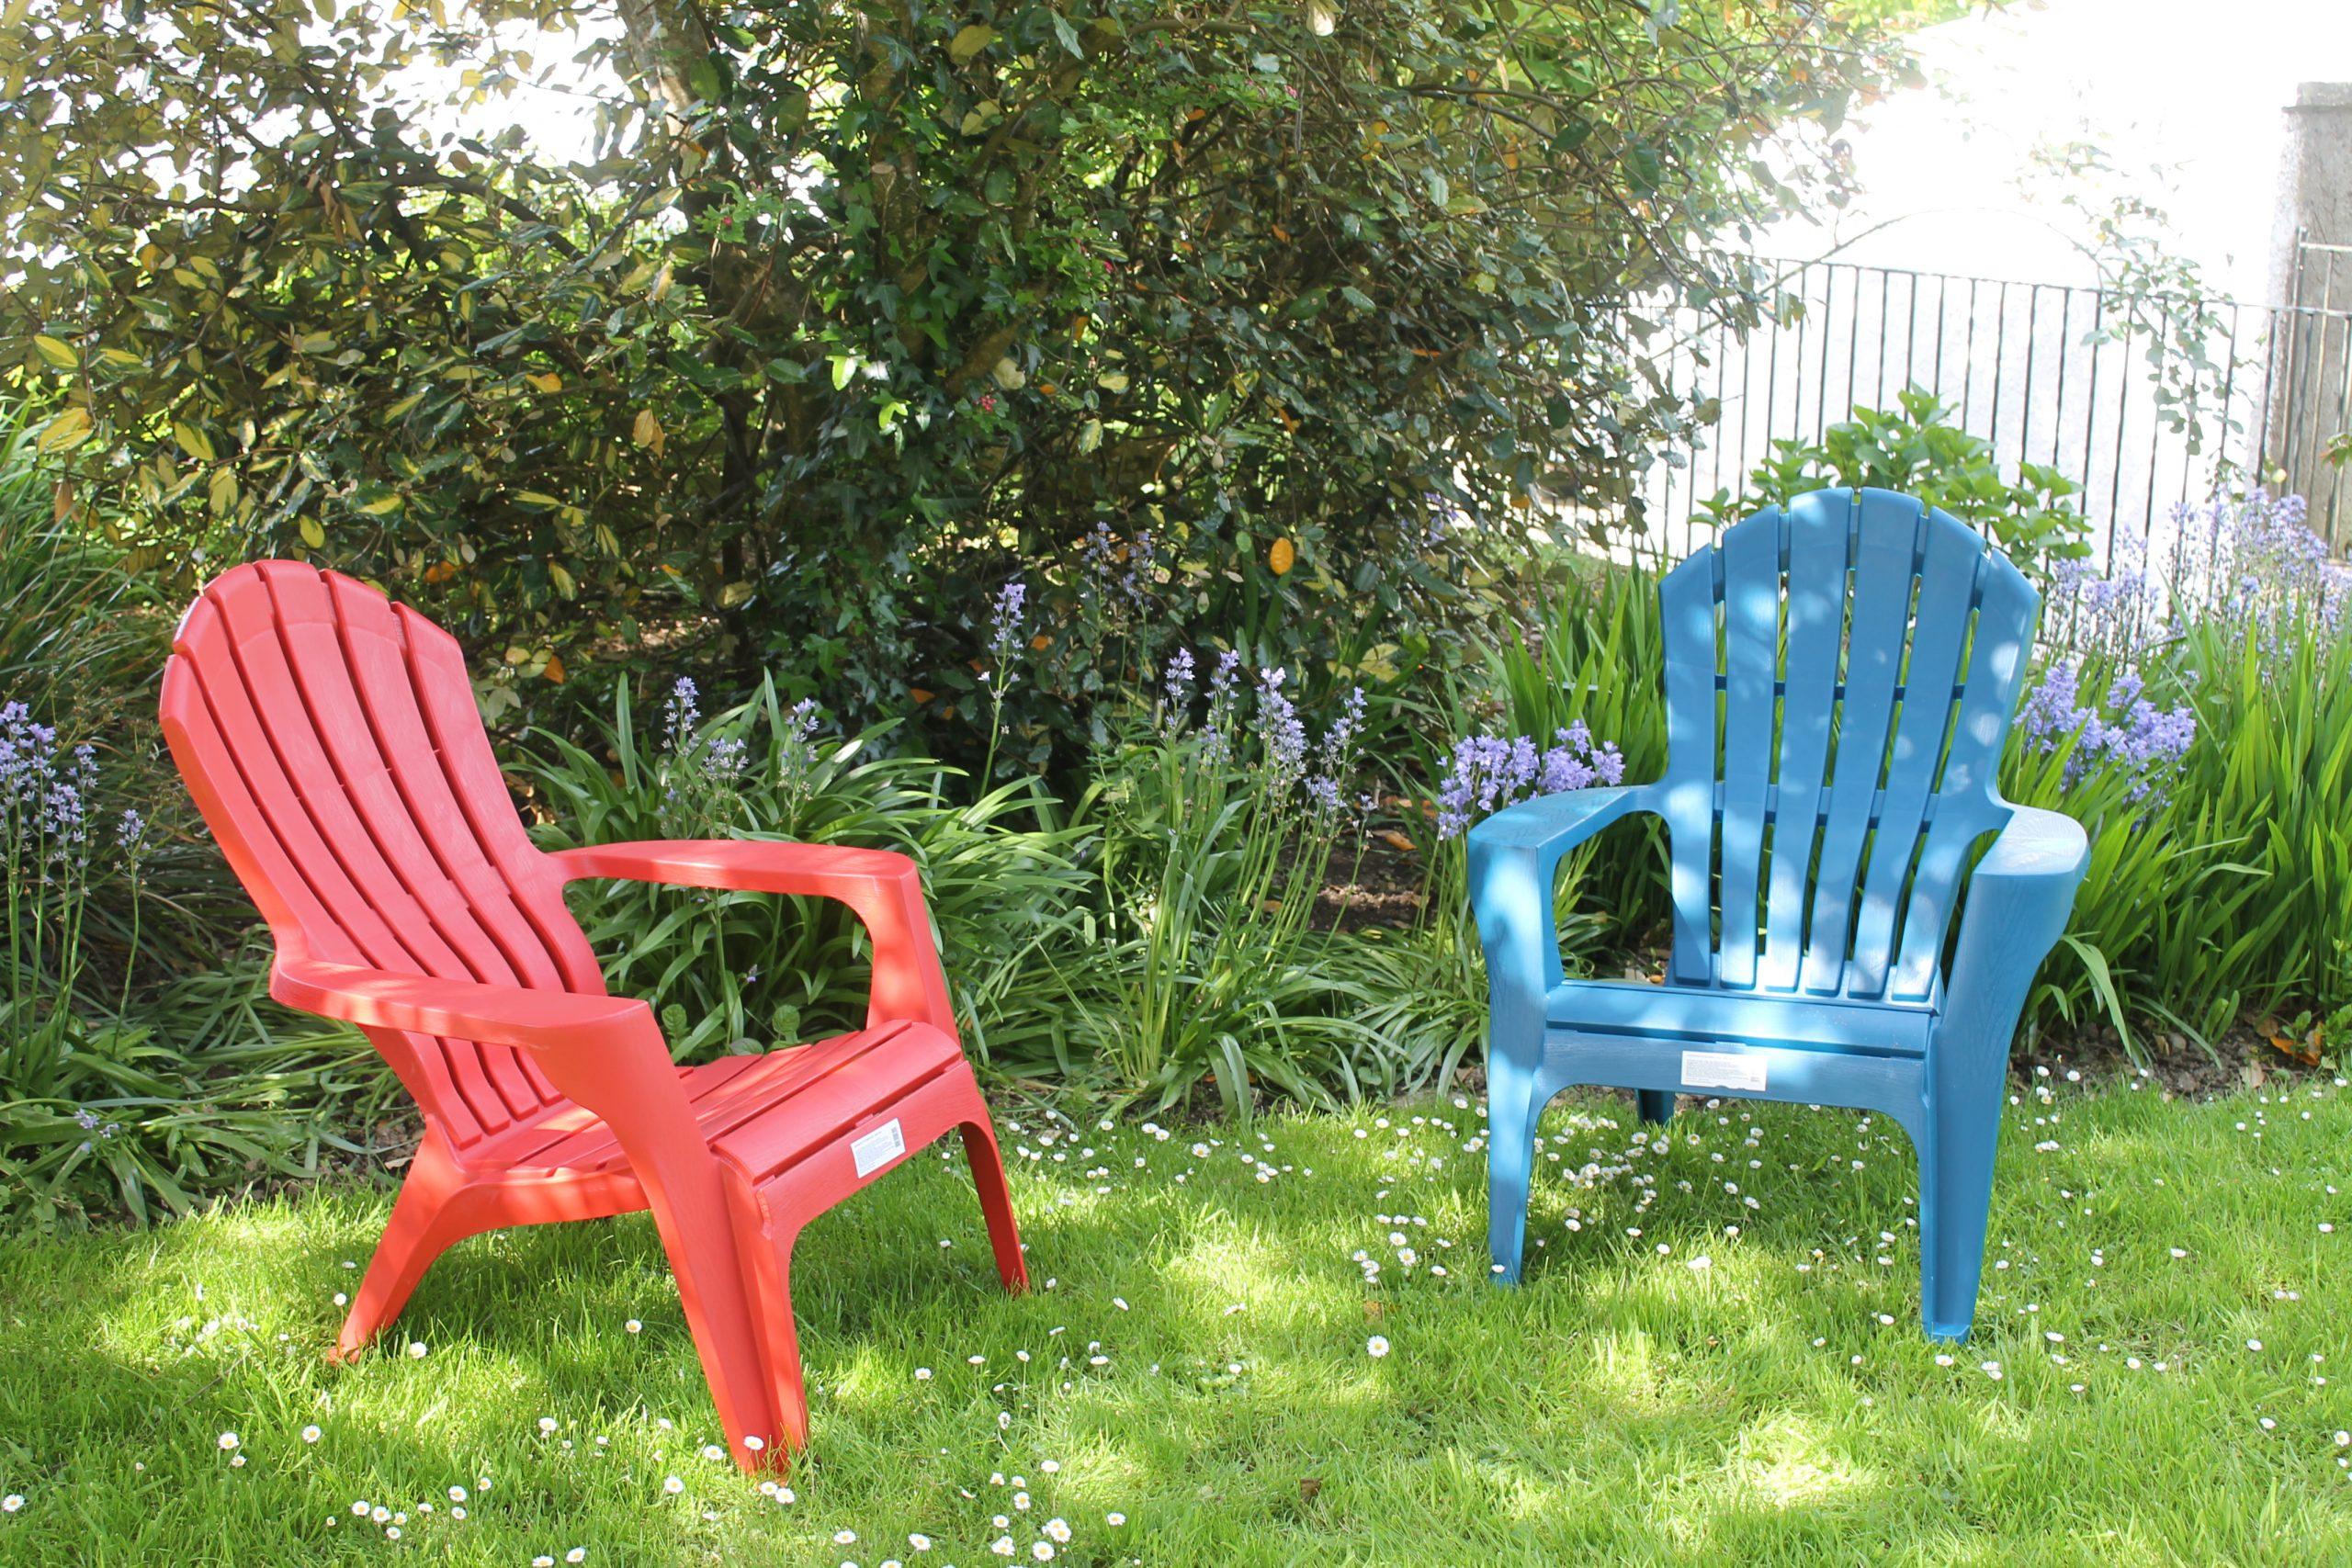 Adirondack Resin Sun Chair Garden Furniture Kilkenny Resin Outdoor Furniture Kilkenny